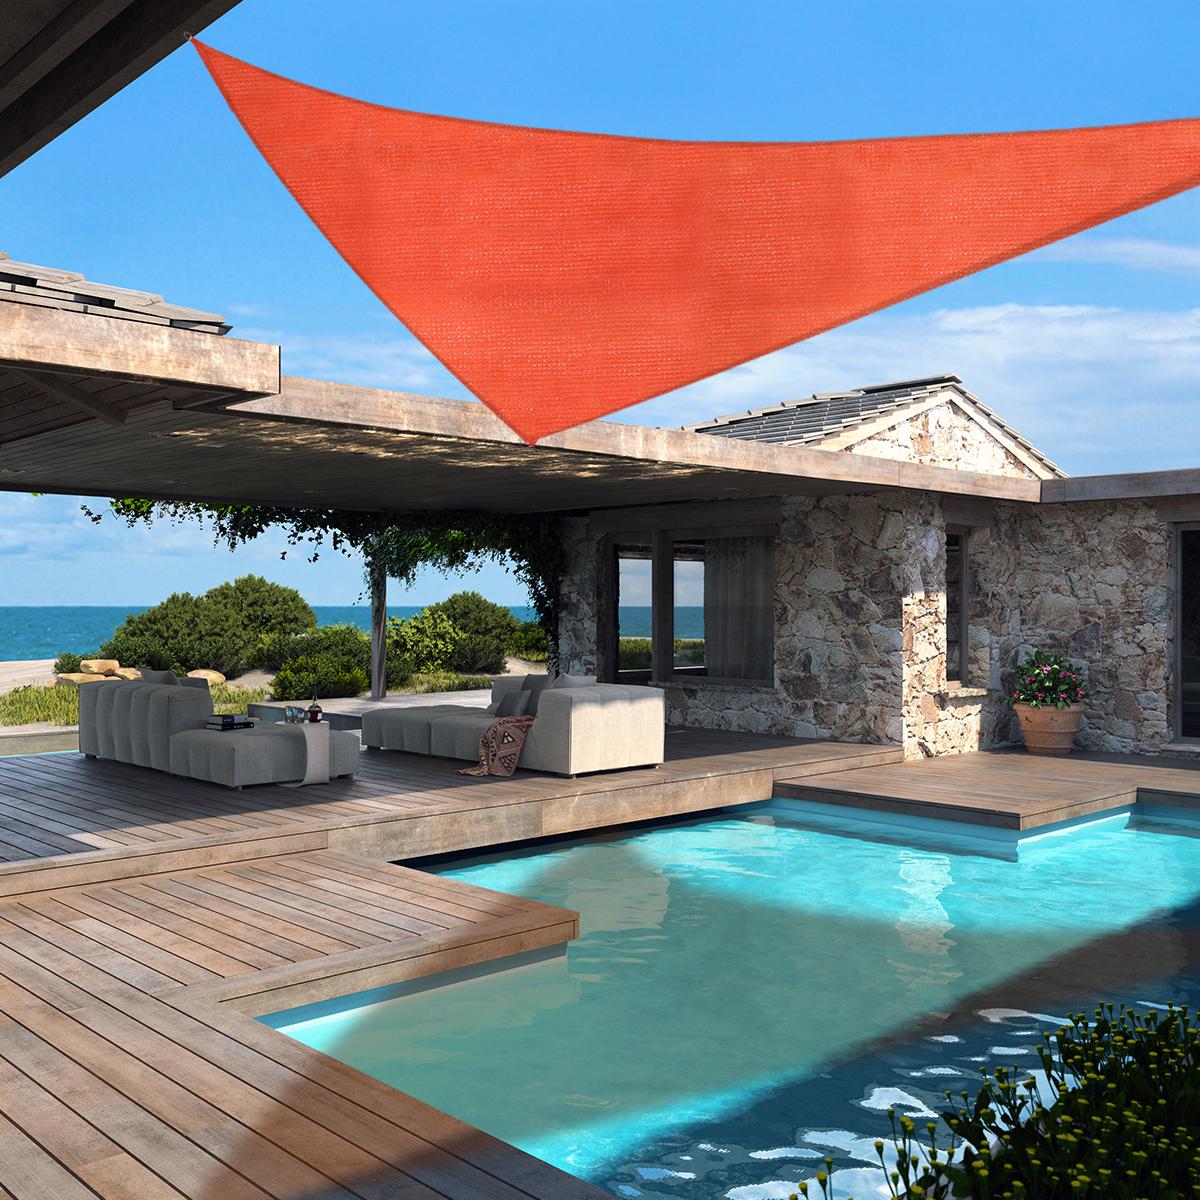 16 5 Ft Triangle Sun Shade Sail Fabric Outdoor Patio Pool Canopy